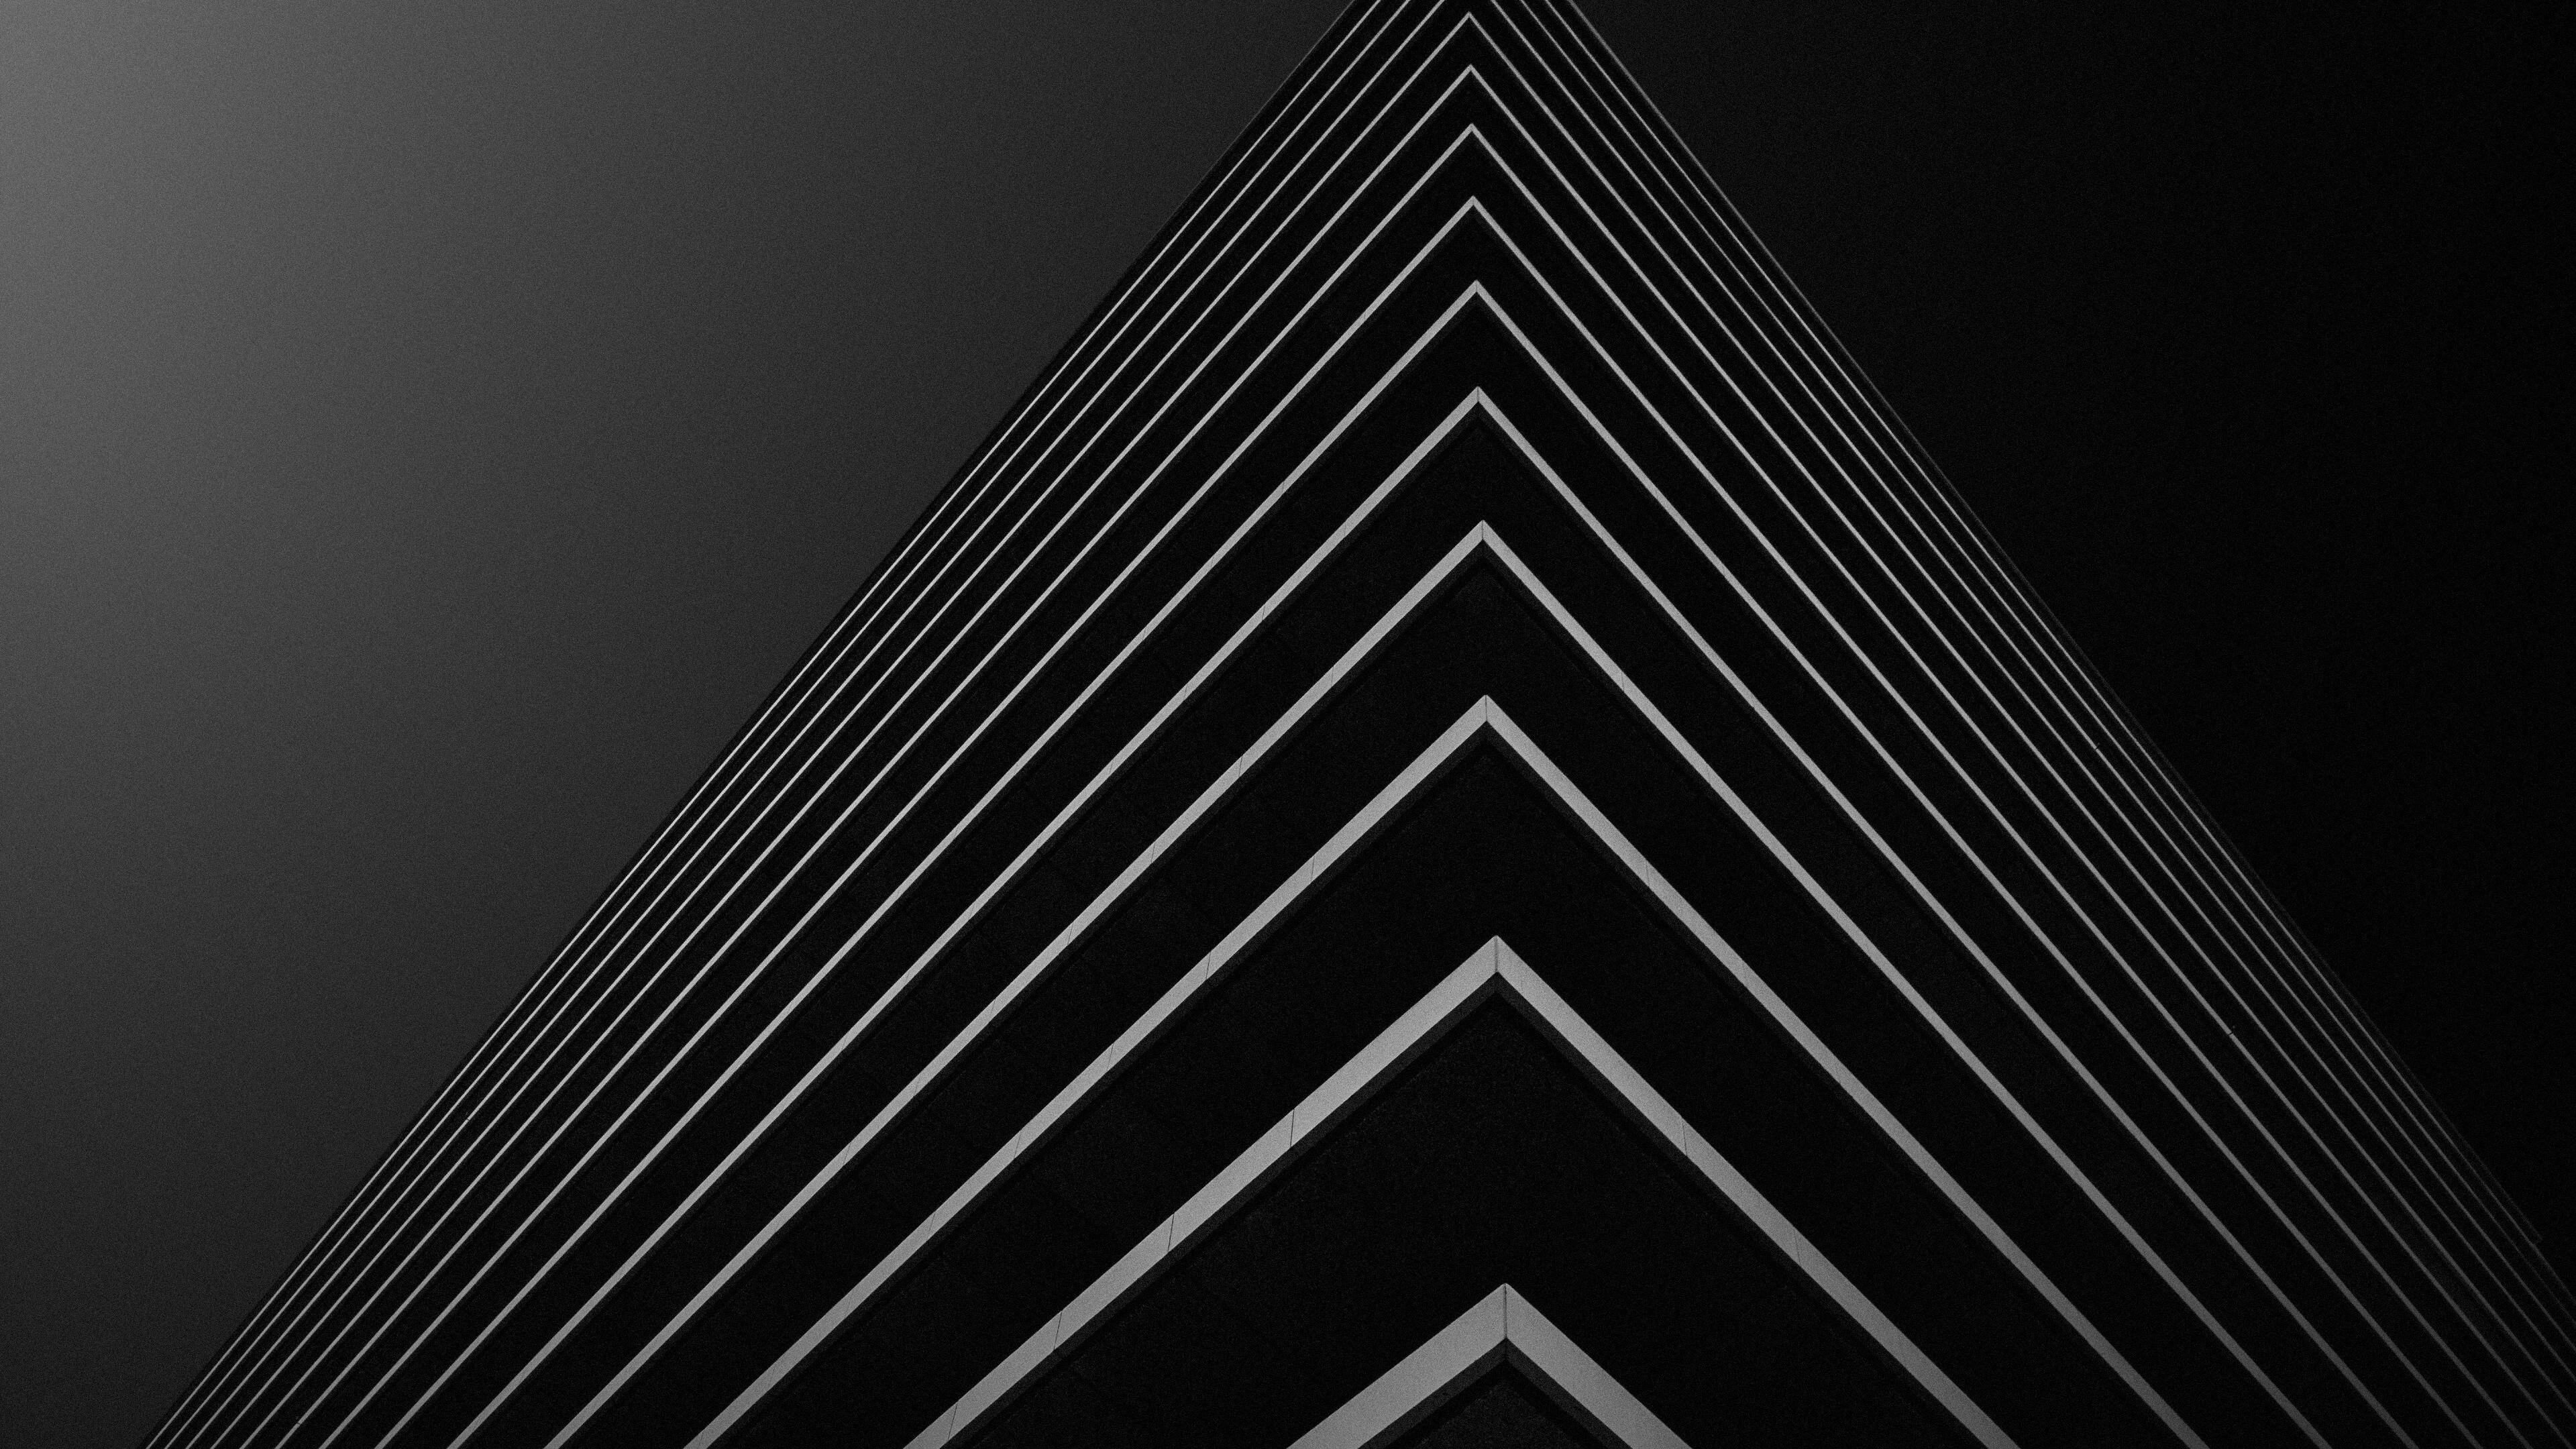 Building Corner in Black Background 4K Wallpaper | HD ...